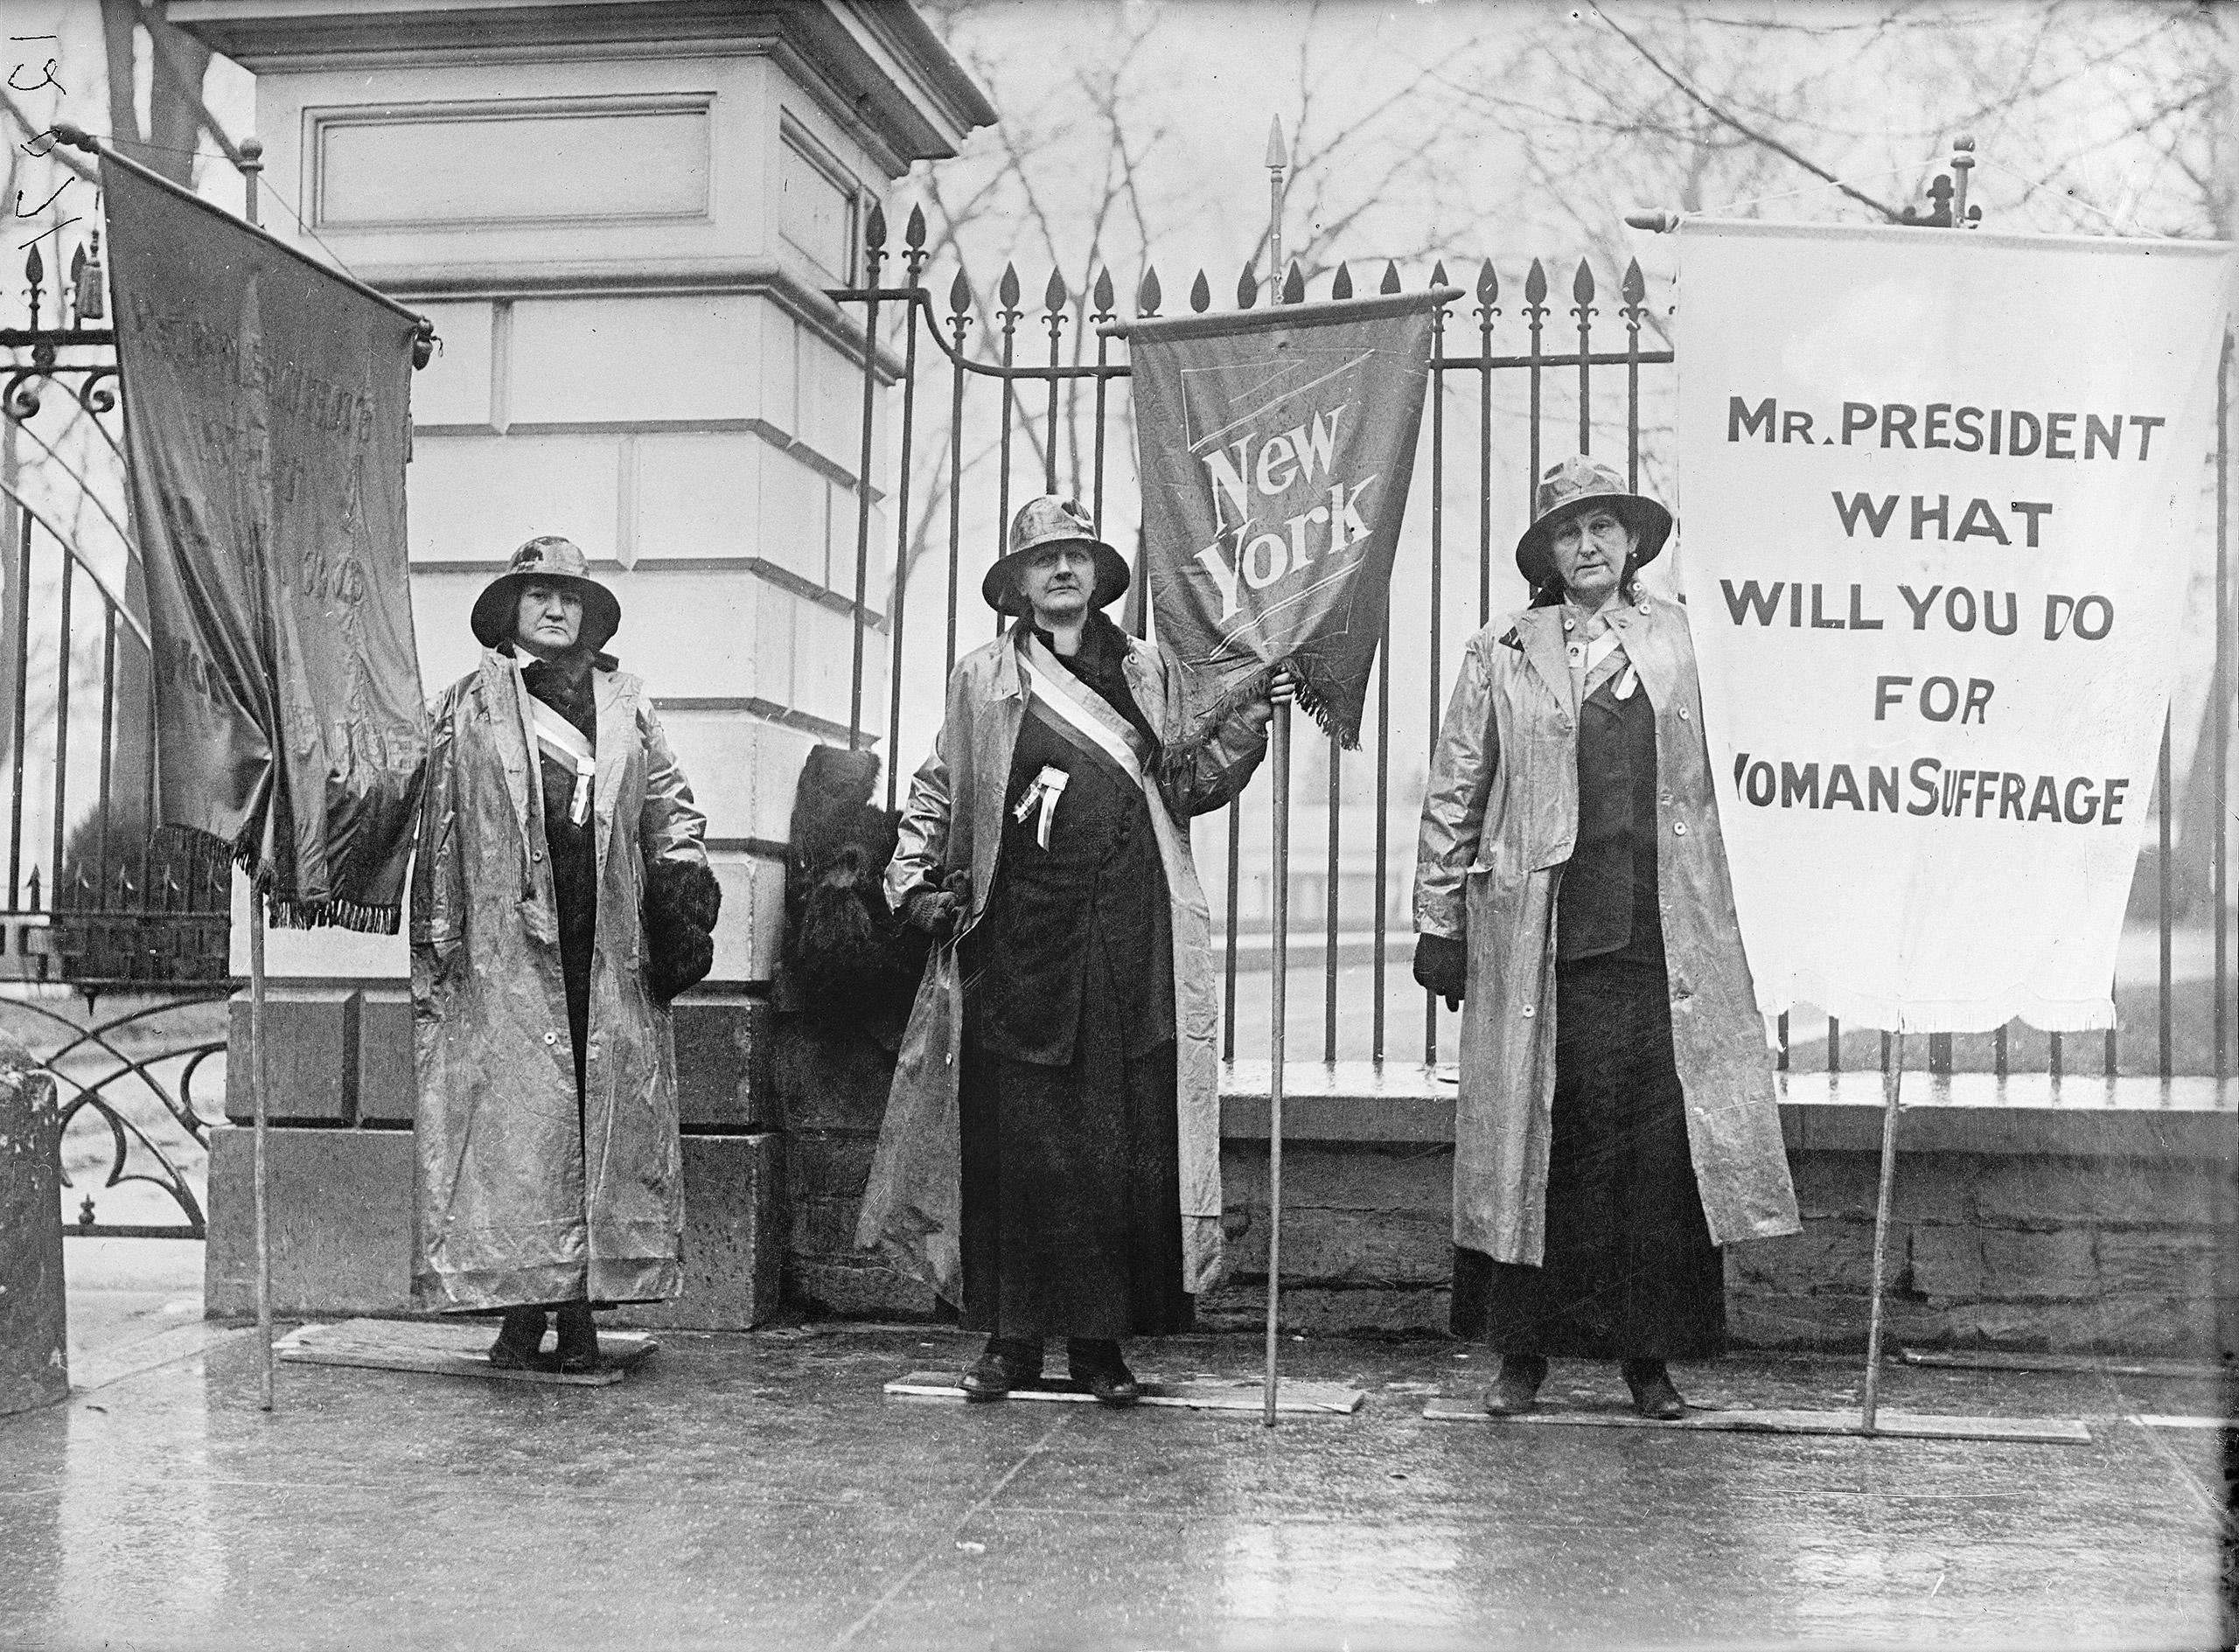 Women's Suffrage picket parade in Washington, D.C., 1917.